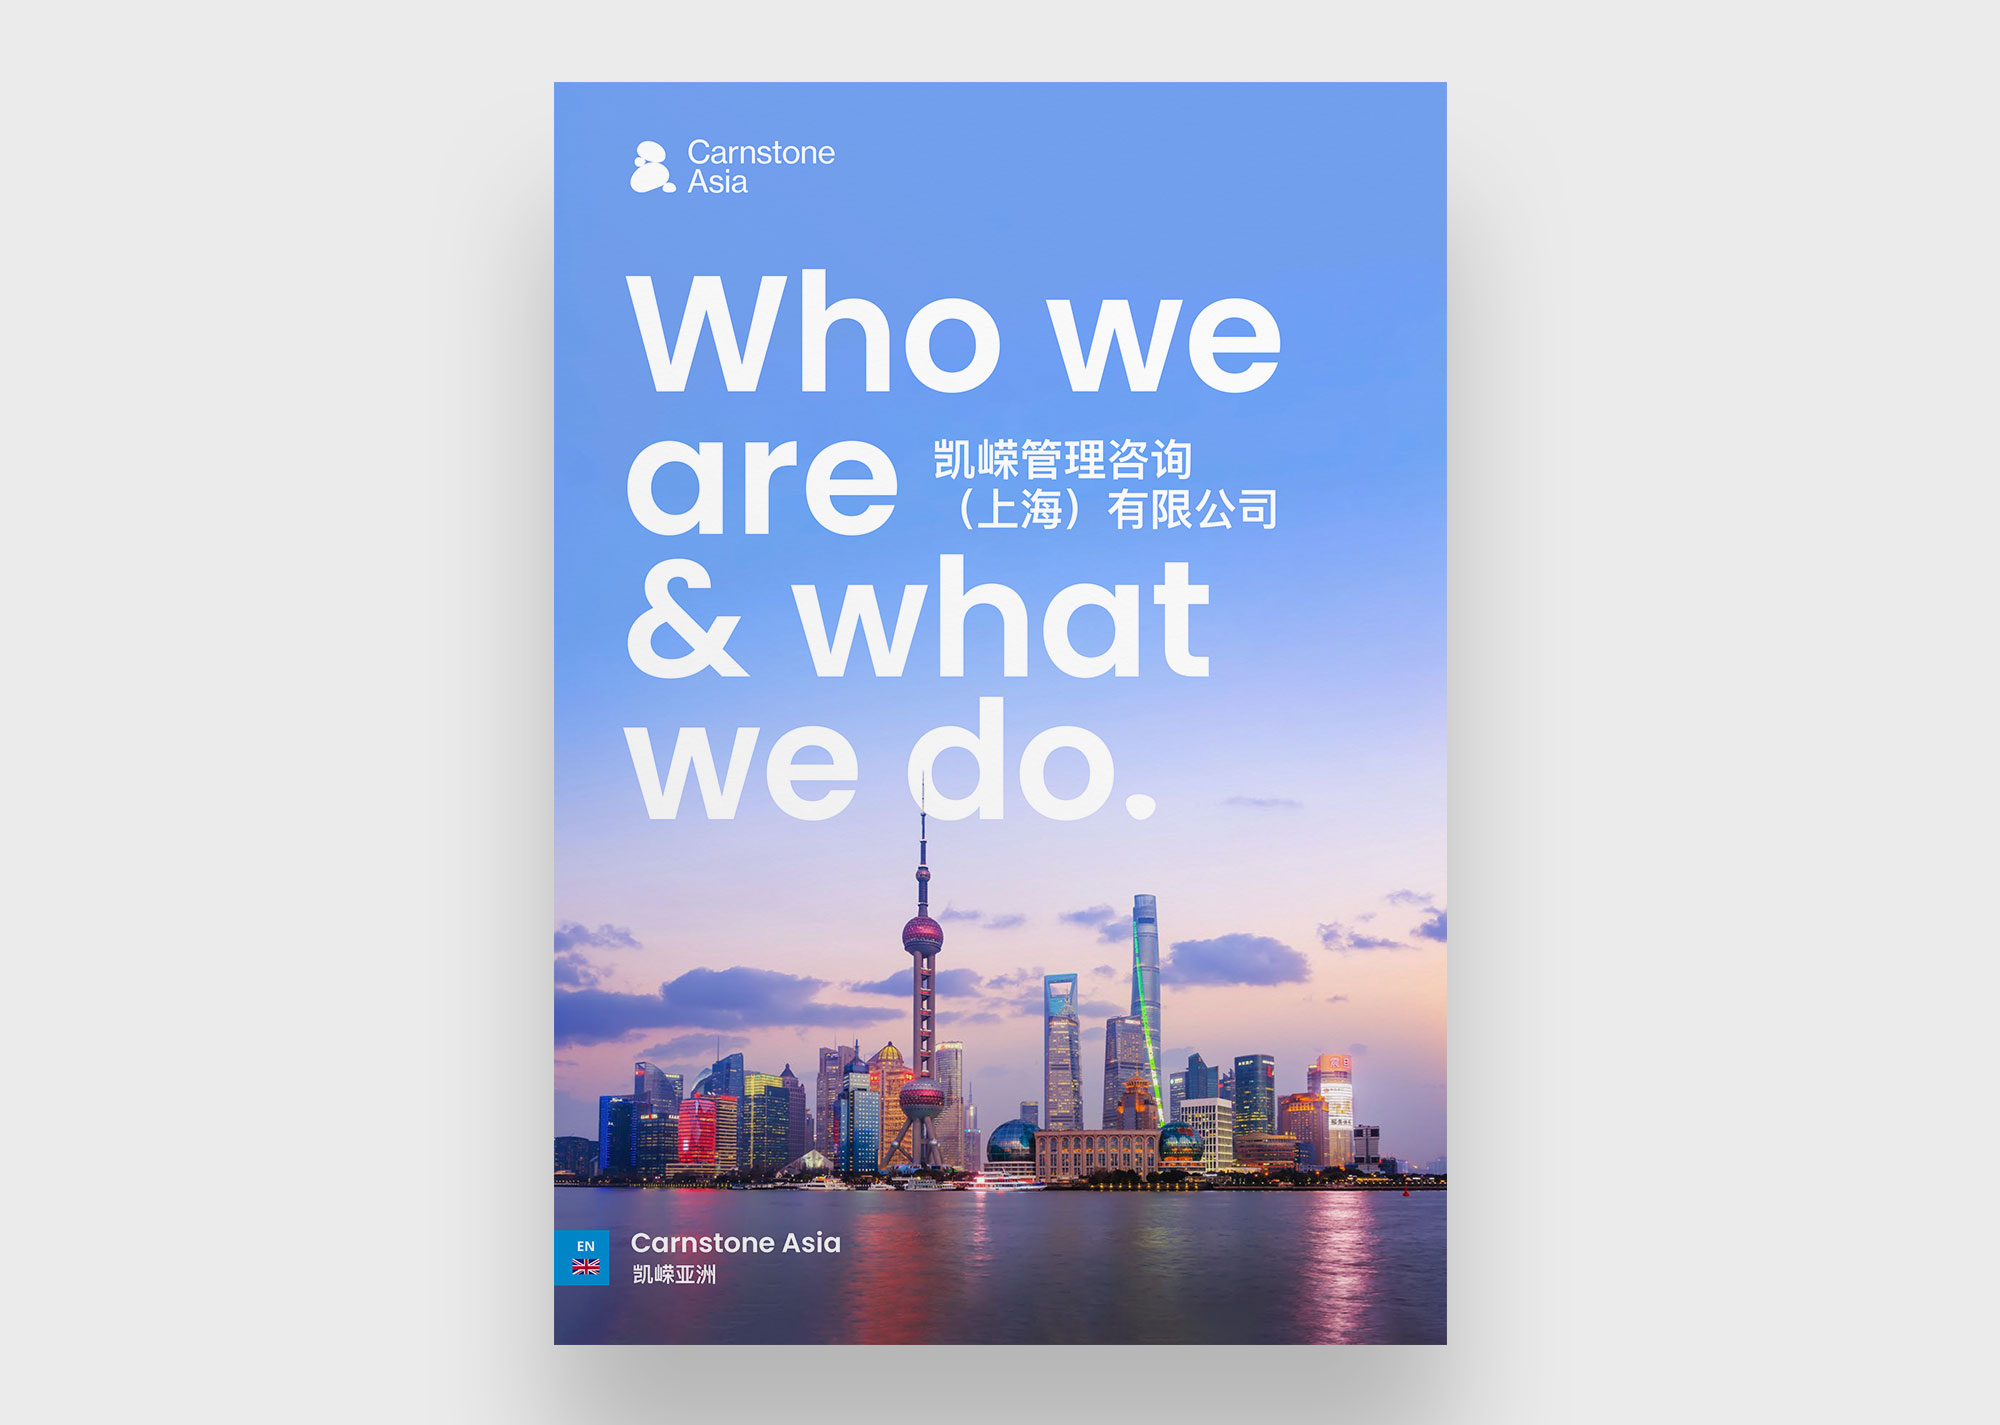 Carnstone Asia digital brochure cover